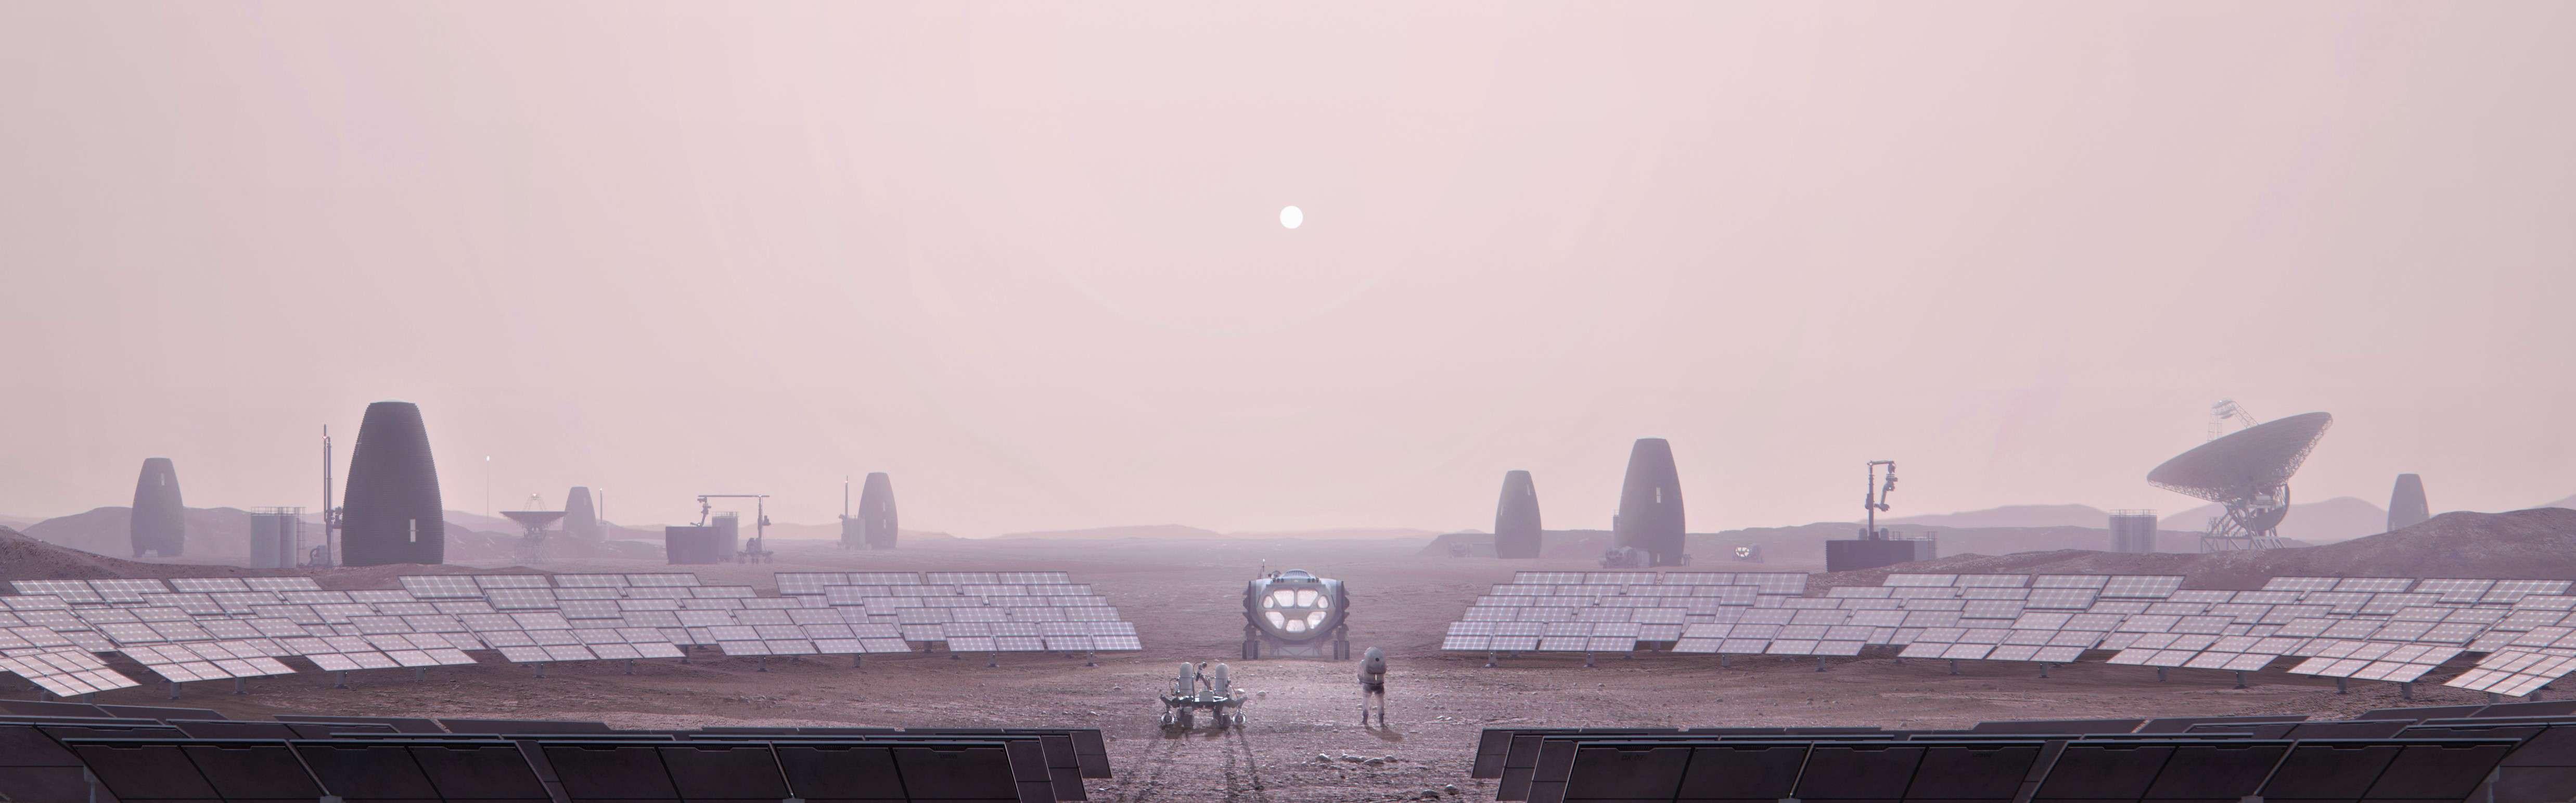 MARSHA Mars habitat colony (AI Space Factory) 3 crop (c)